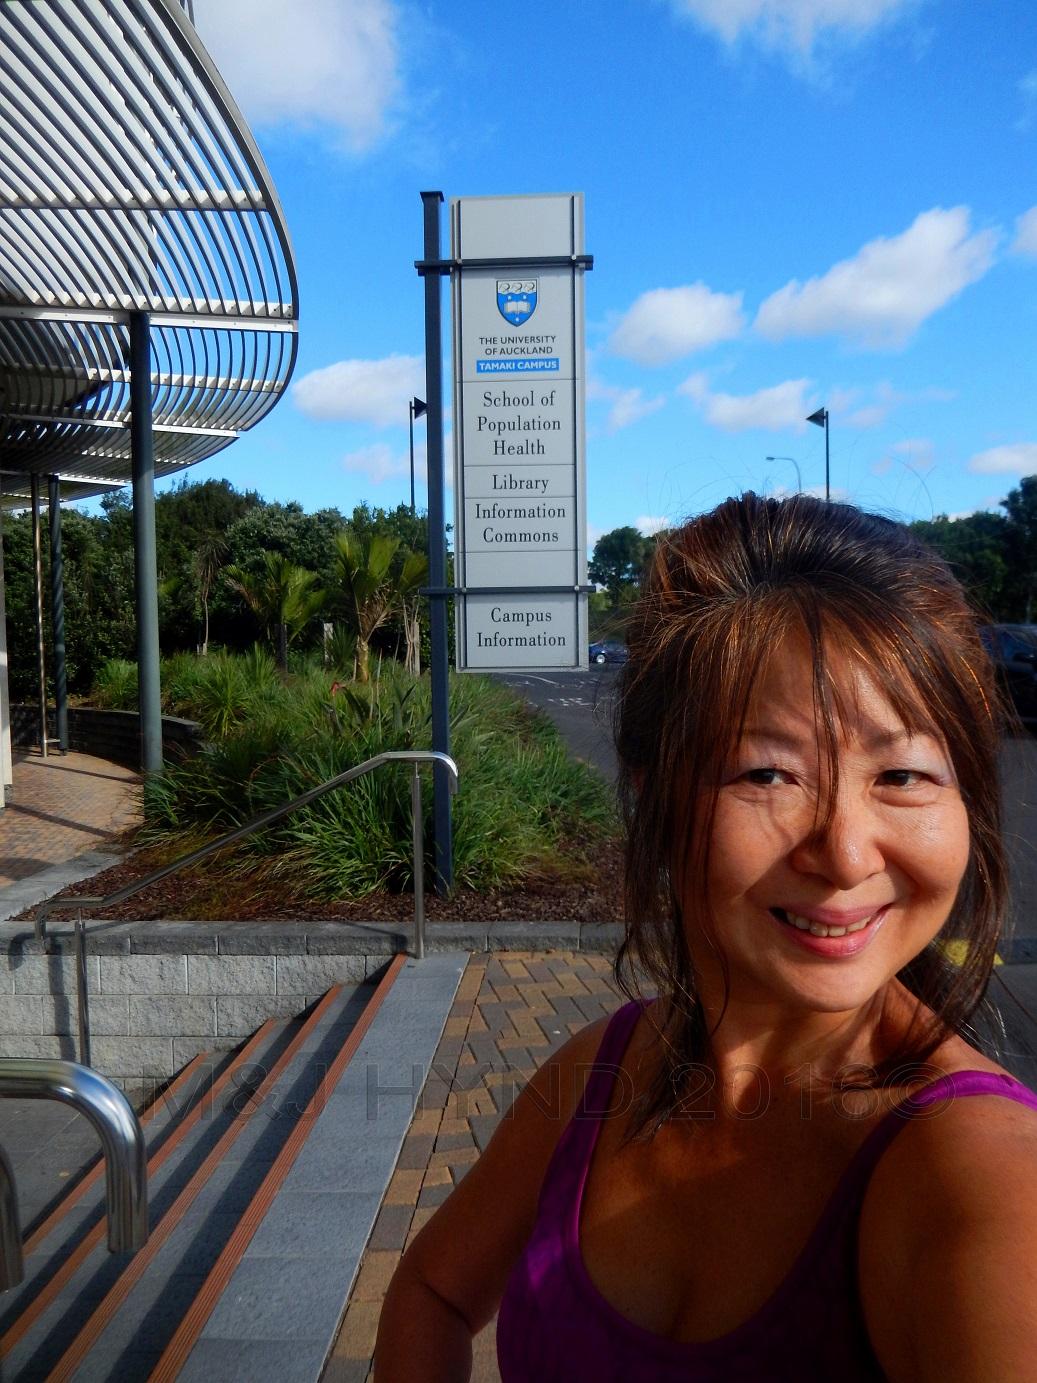 University of Auckland Tamaki campus, Auckland NZ